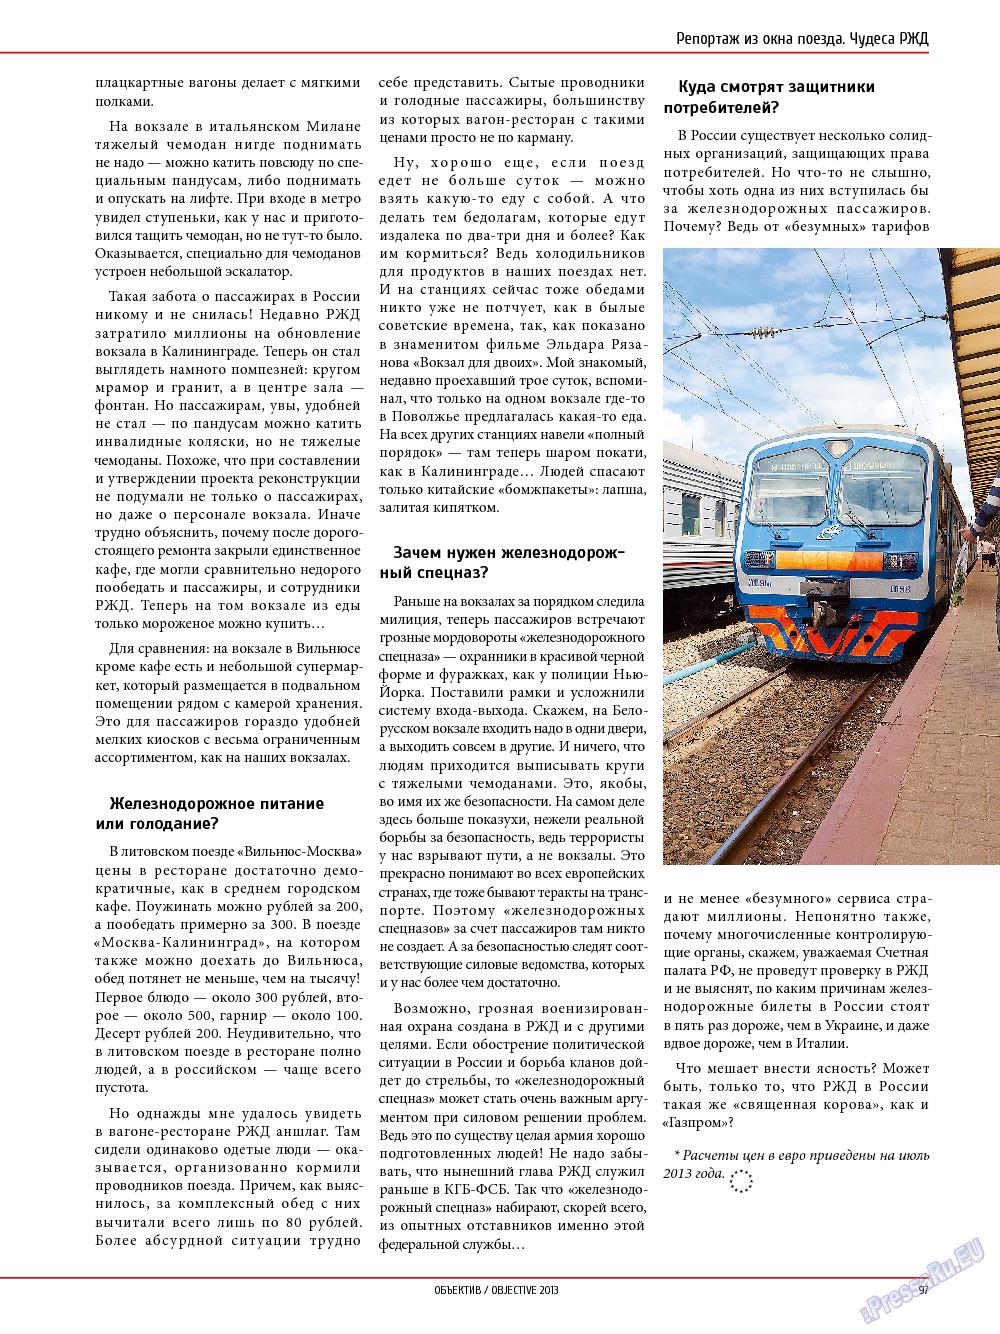 Объектив EU (журнал). 2013 год, номер 5, стр. 97